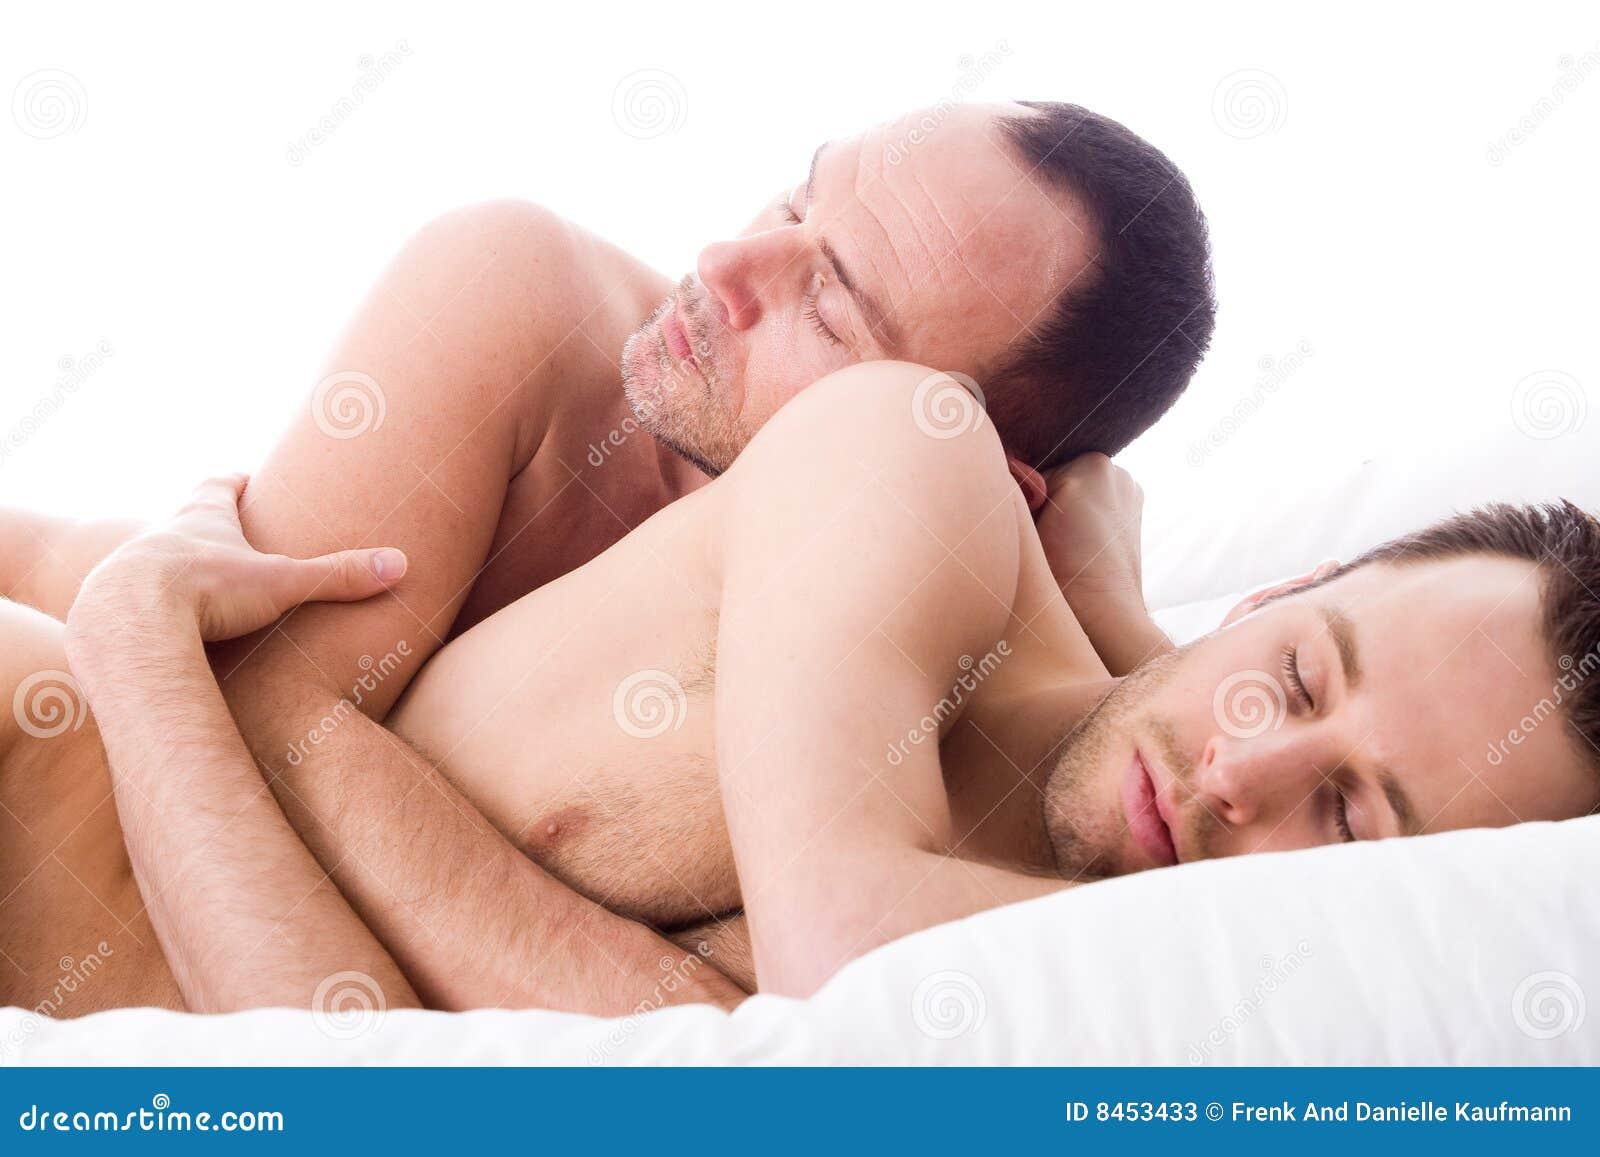 Dos chicos follan durmiendo amigo